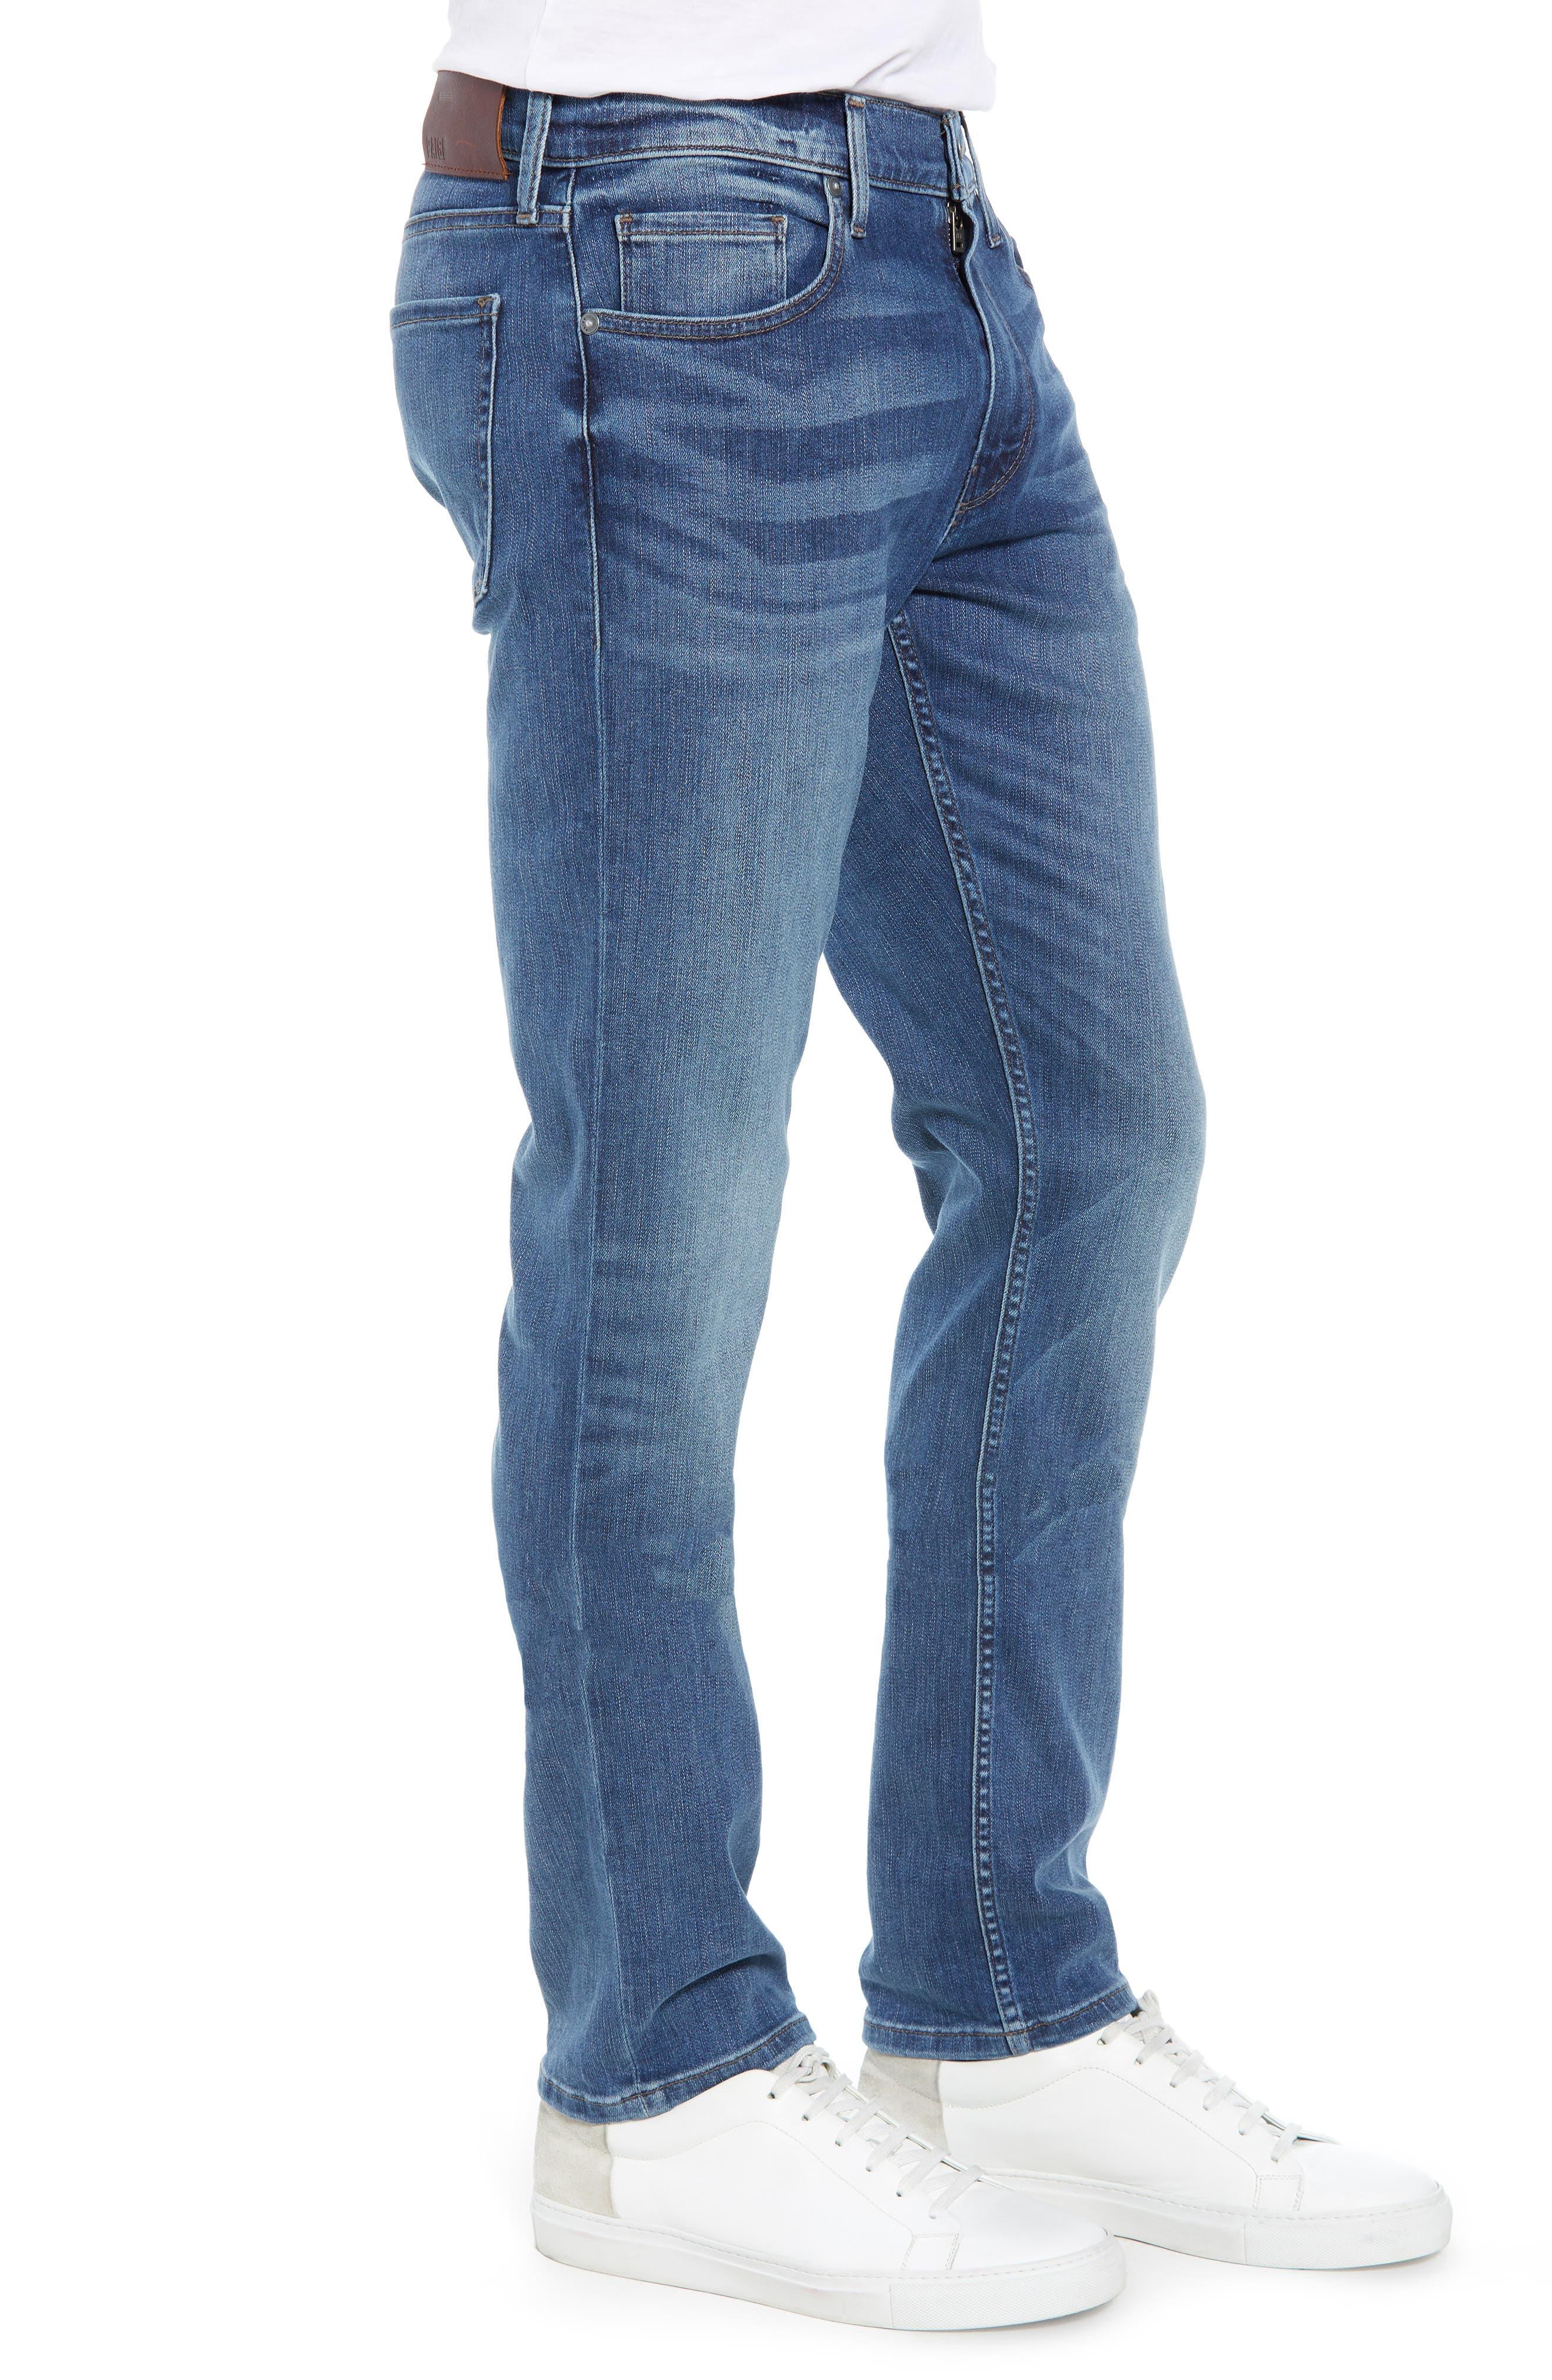 Transcend Vintage - Lennox Slim Fit Jeans,                             Alternate thumbnail 3, color,                             400